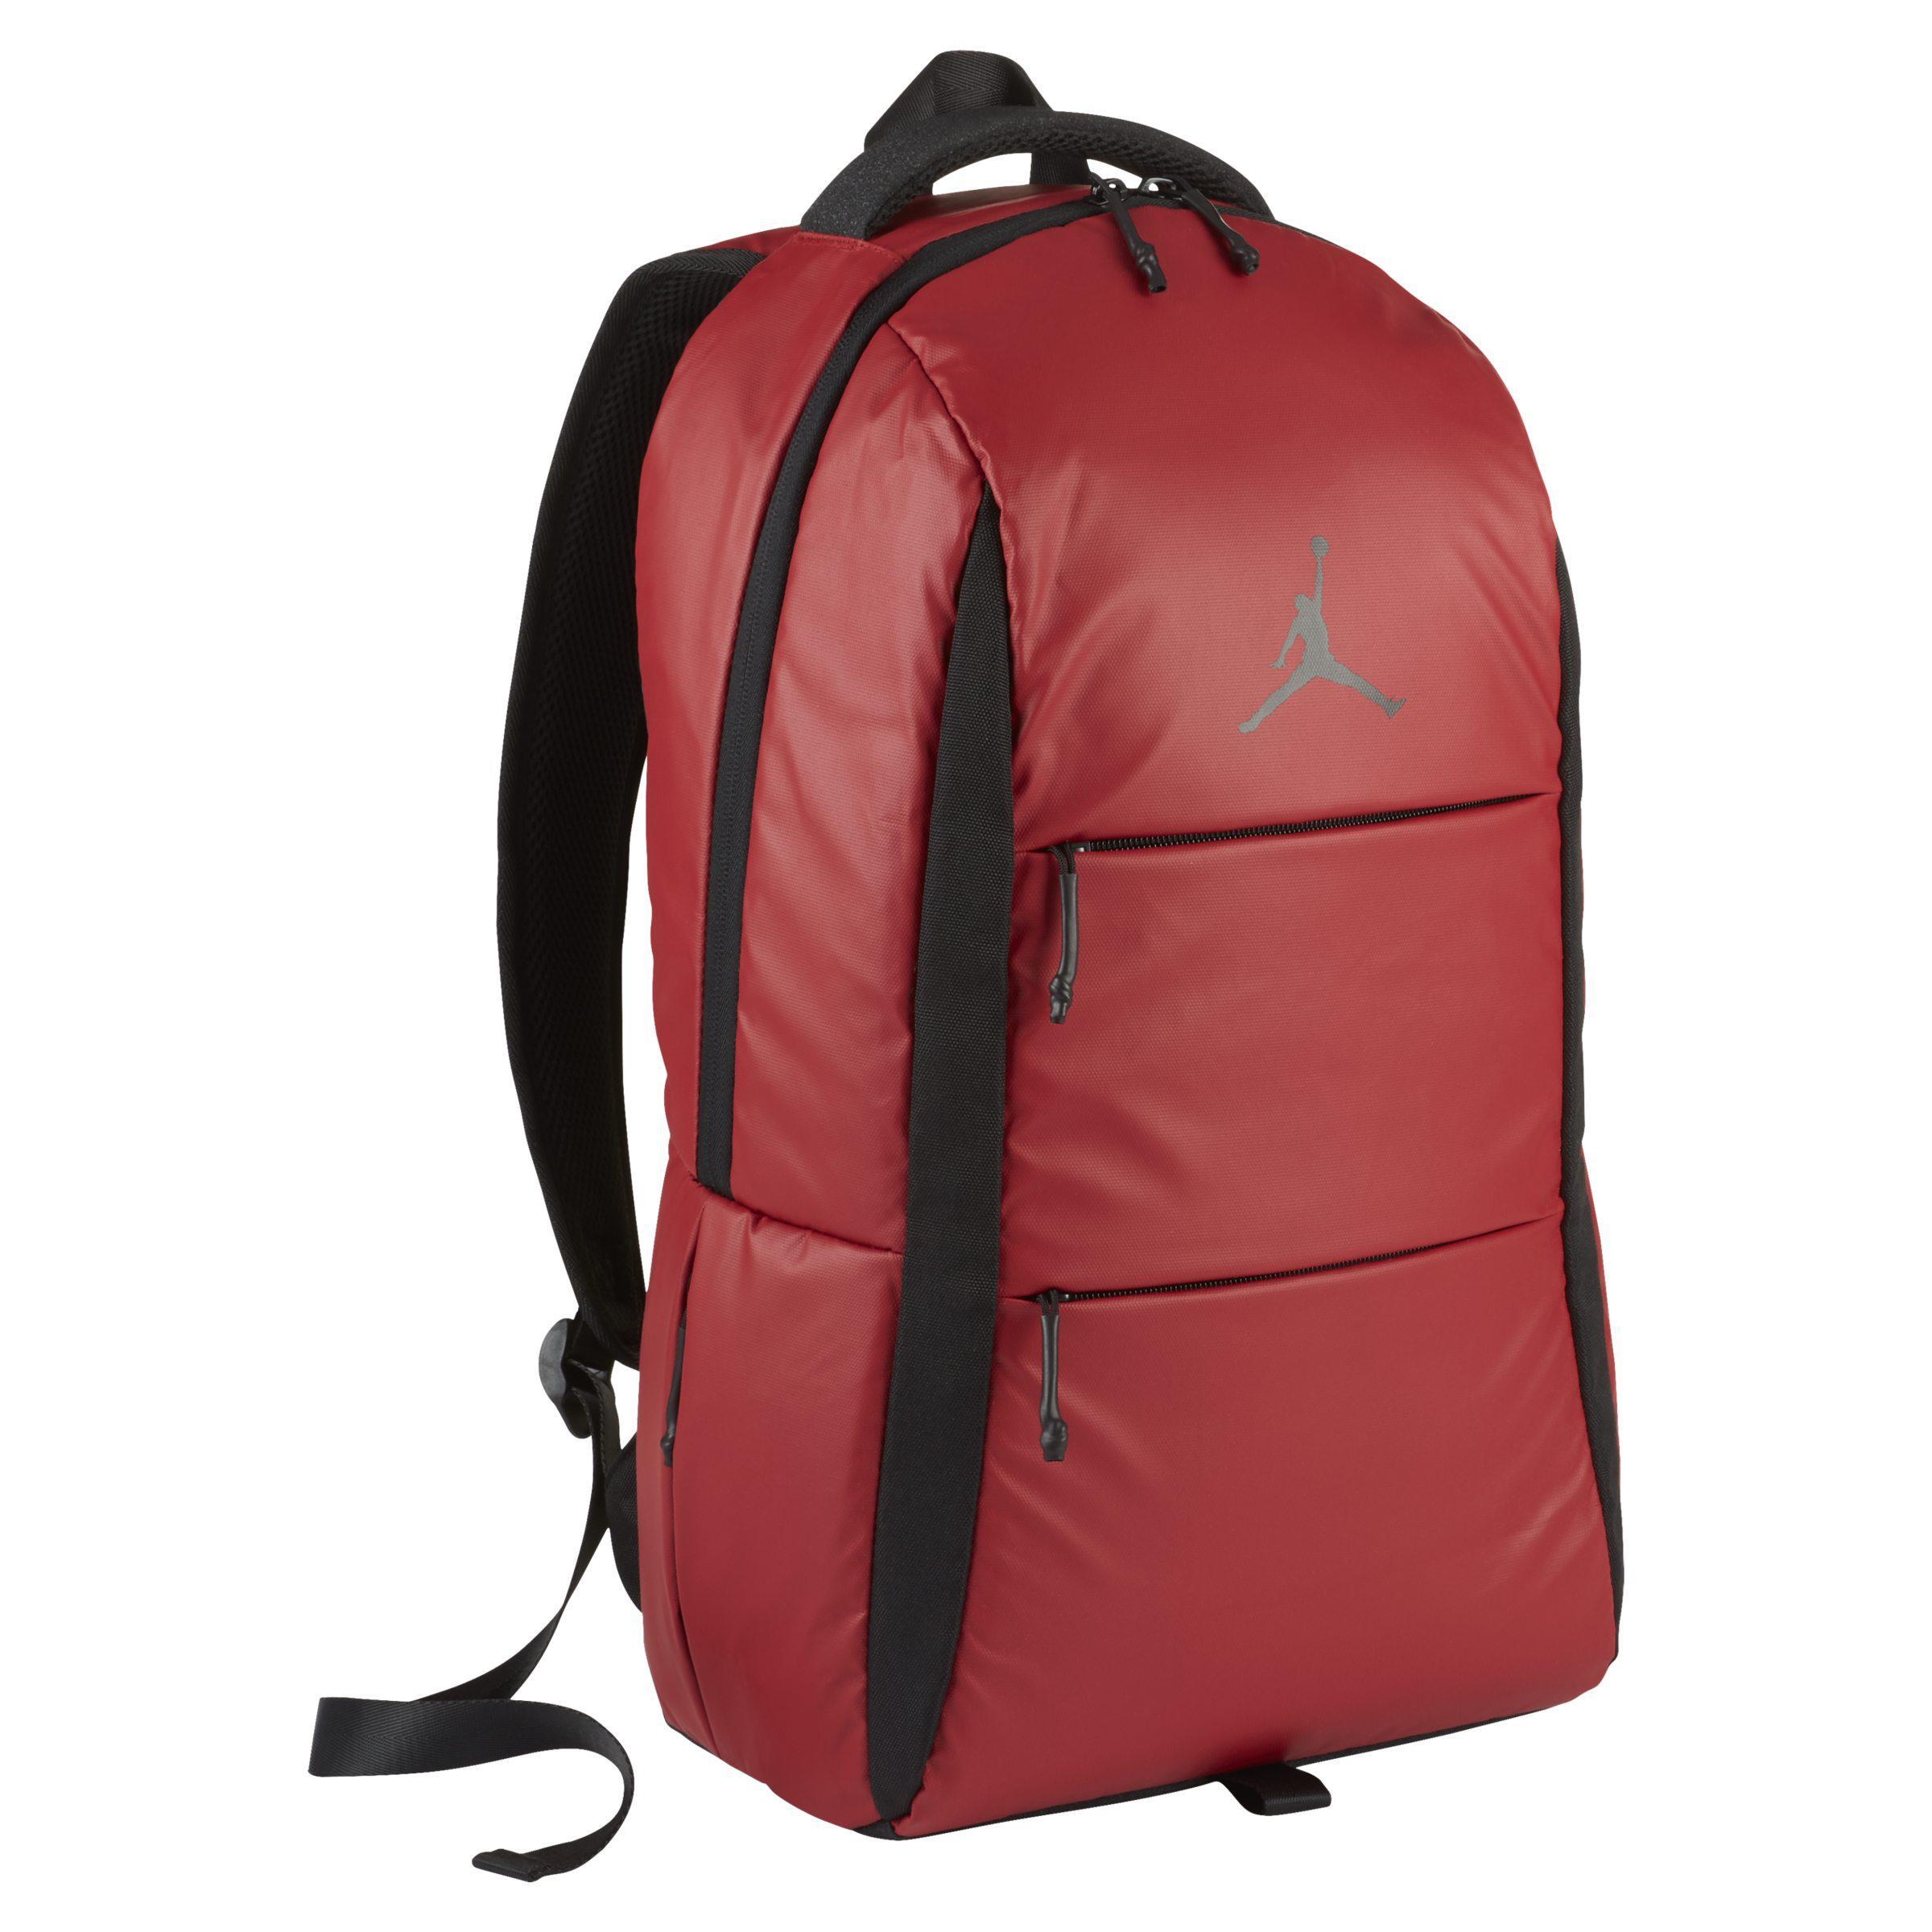 Nike jordan backpack in red lyst jpg 2400x2400 Jordan backpack 7997f68f97472